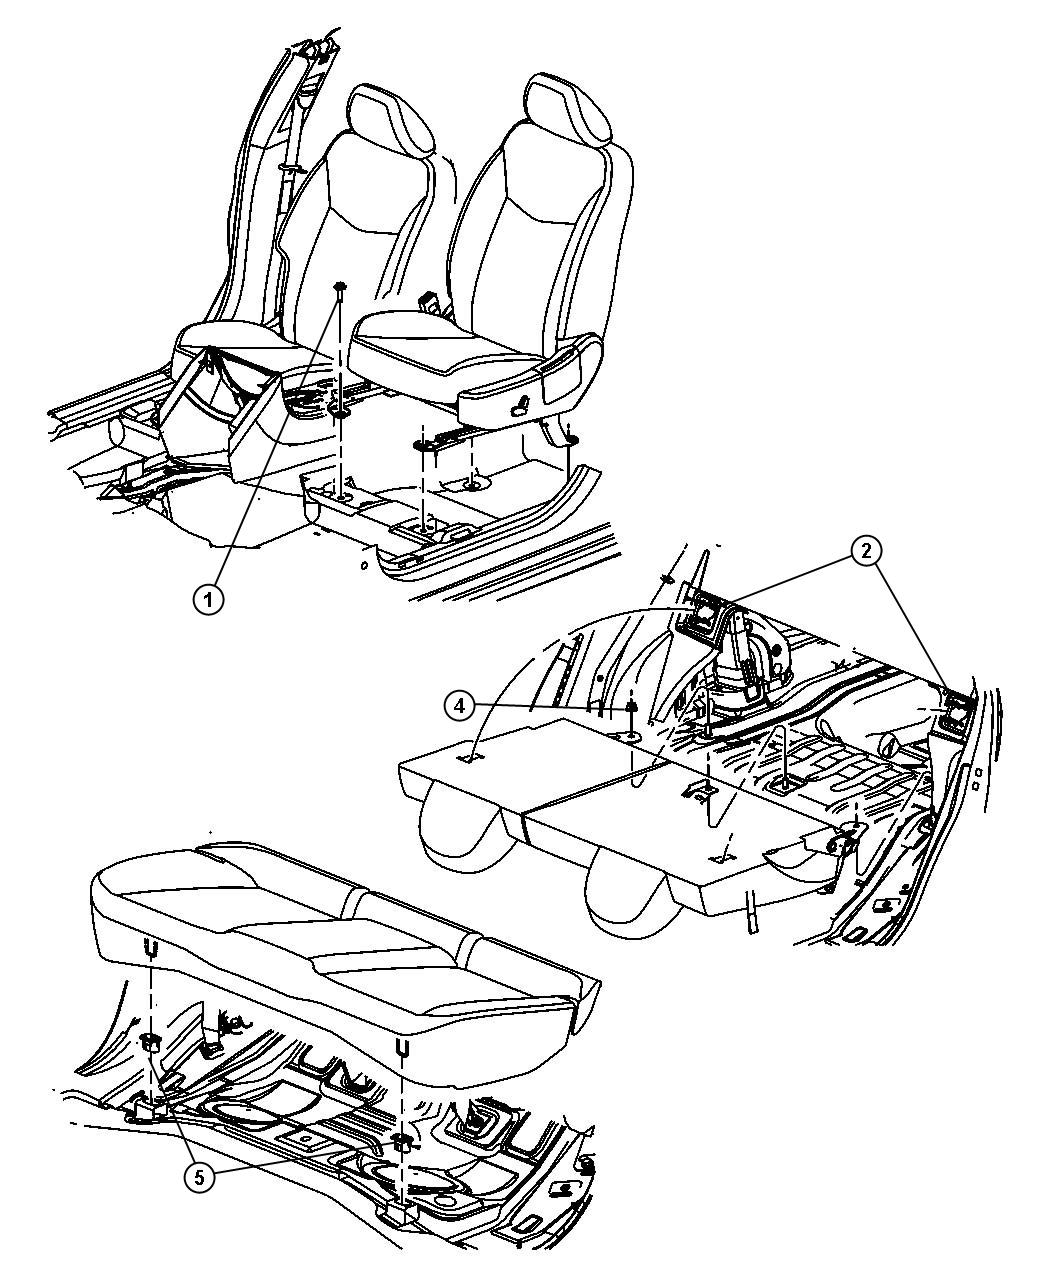 Dodge Caliber Nut Hex Flange M12 M12x1 5 Mounting